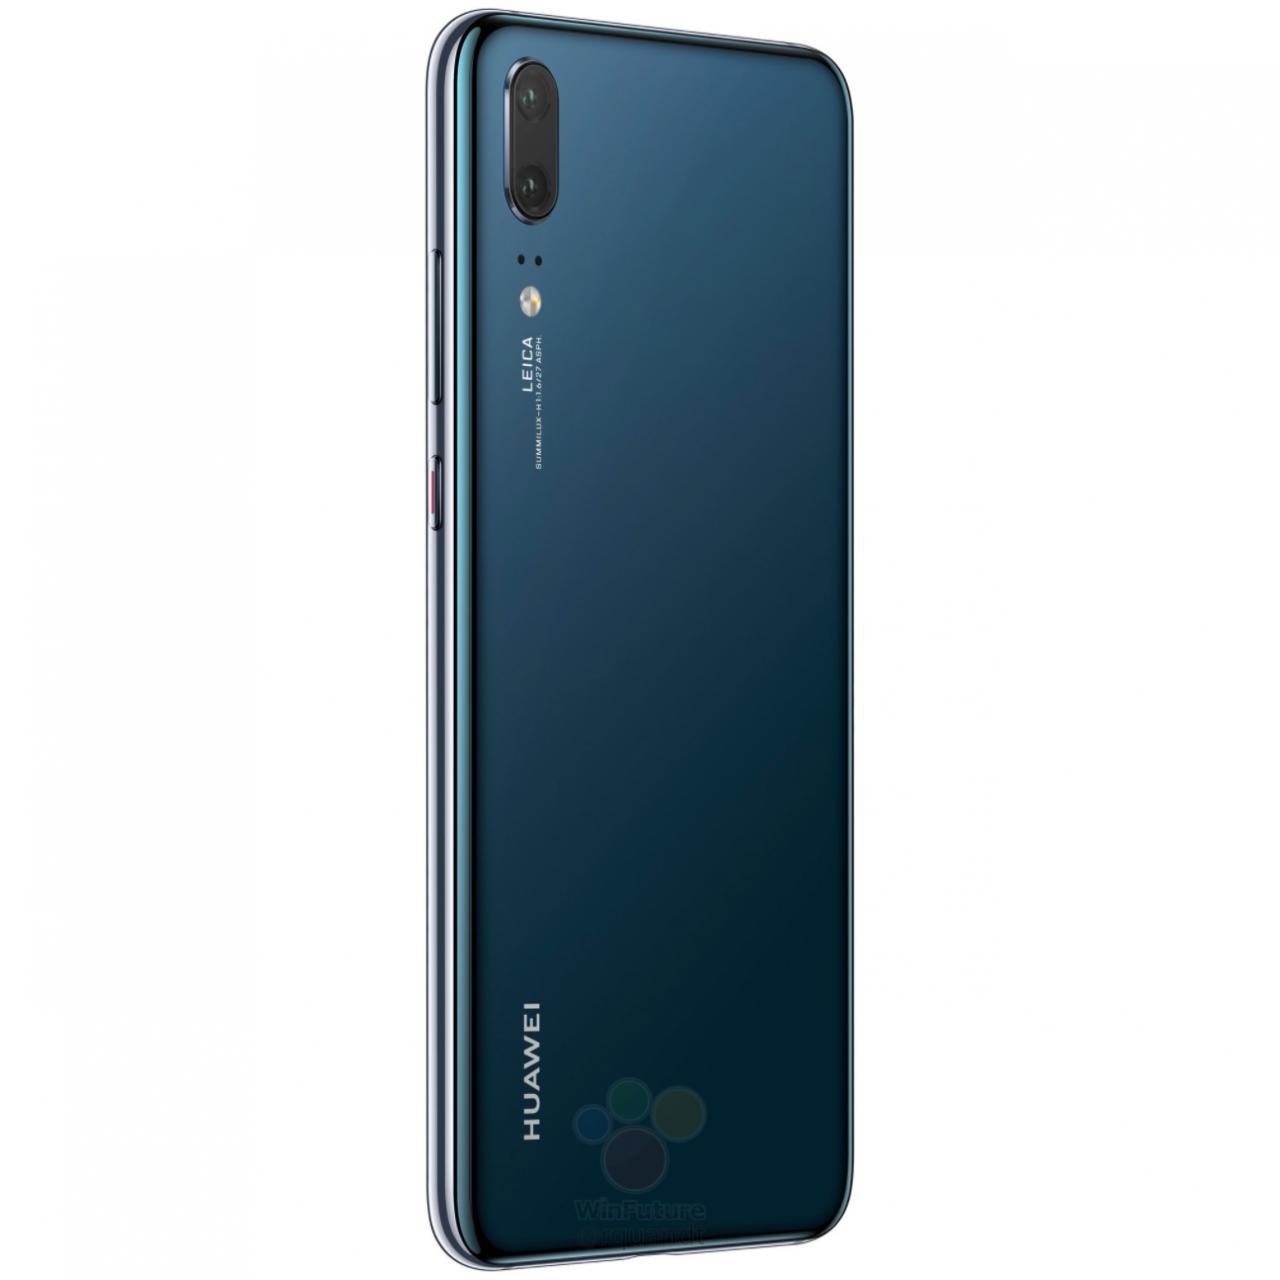 Huawei P20, P20 Pro ve P20 Lite resmi görüntüleri - Page 2